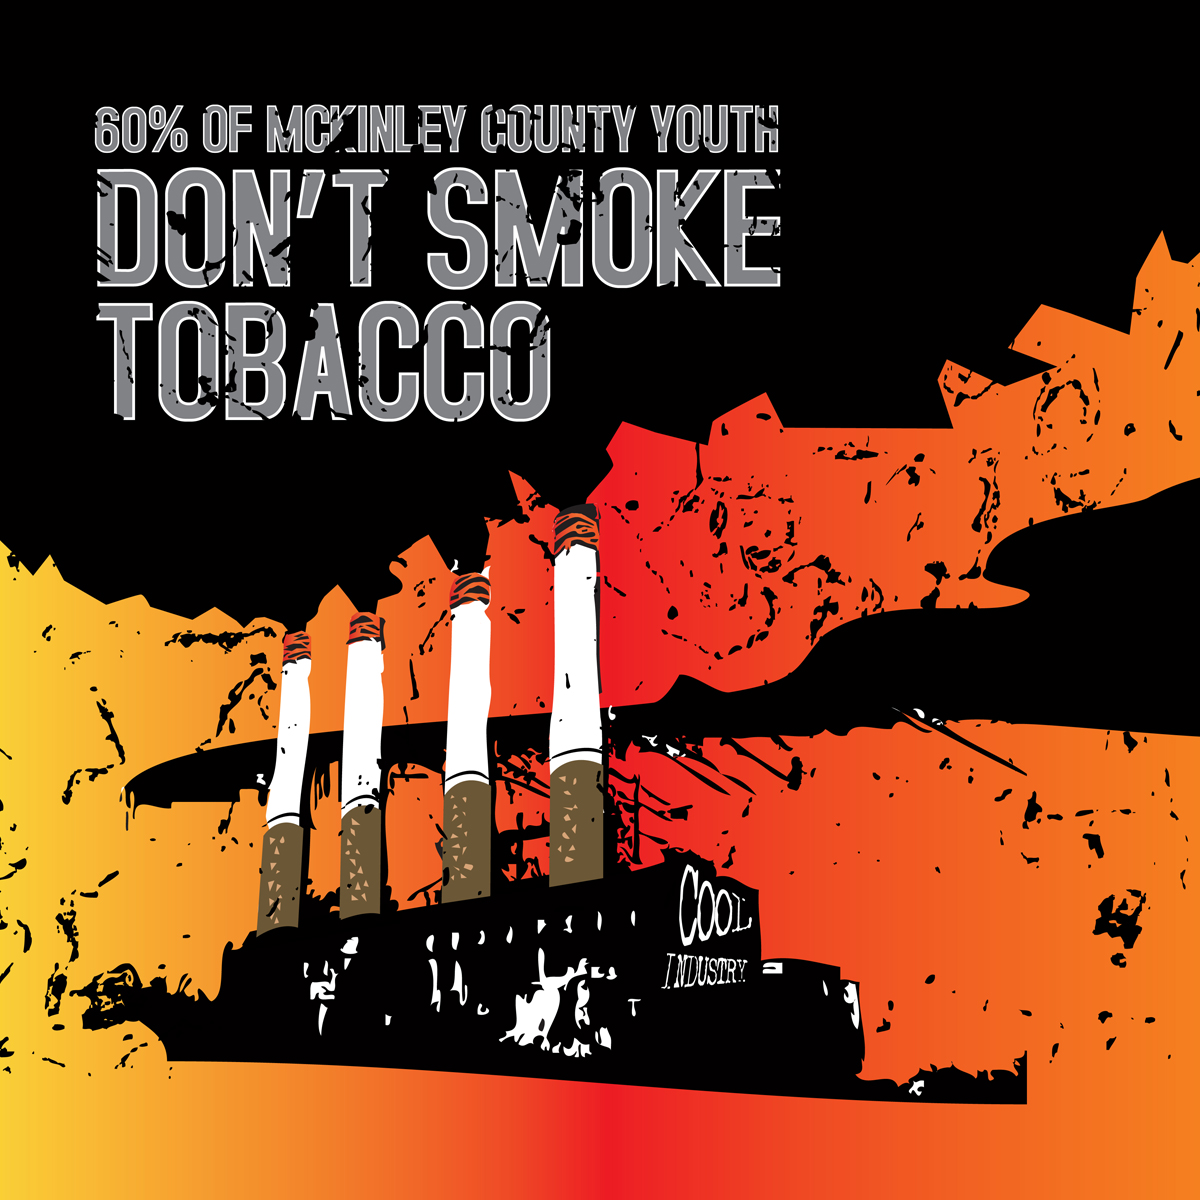 Smog-n-Smokes Factory 100% Campaign